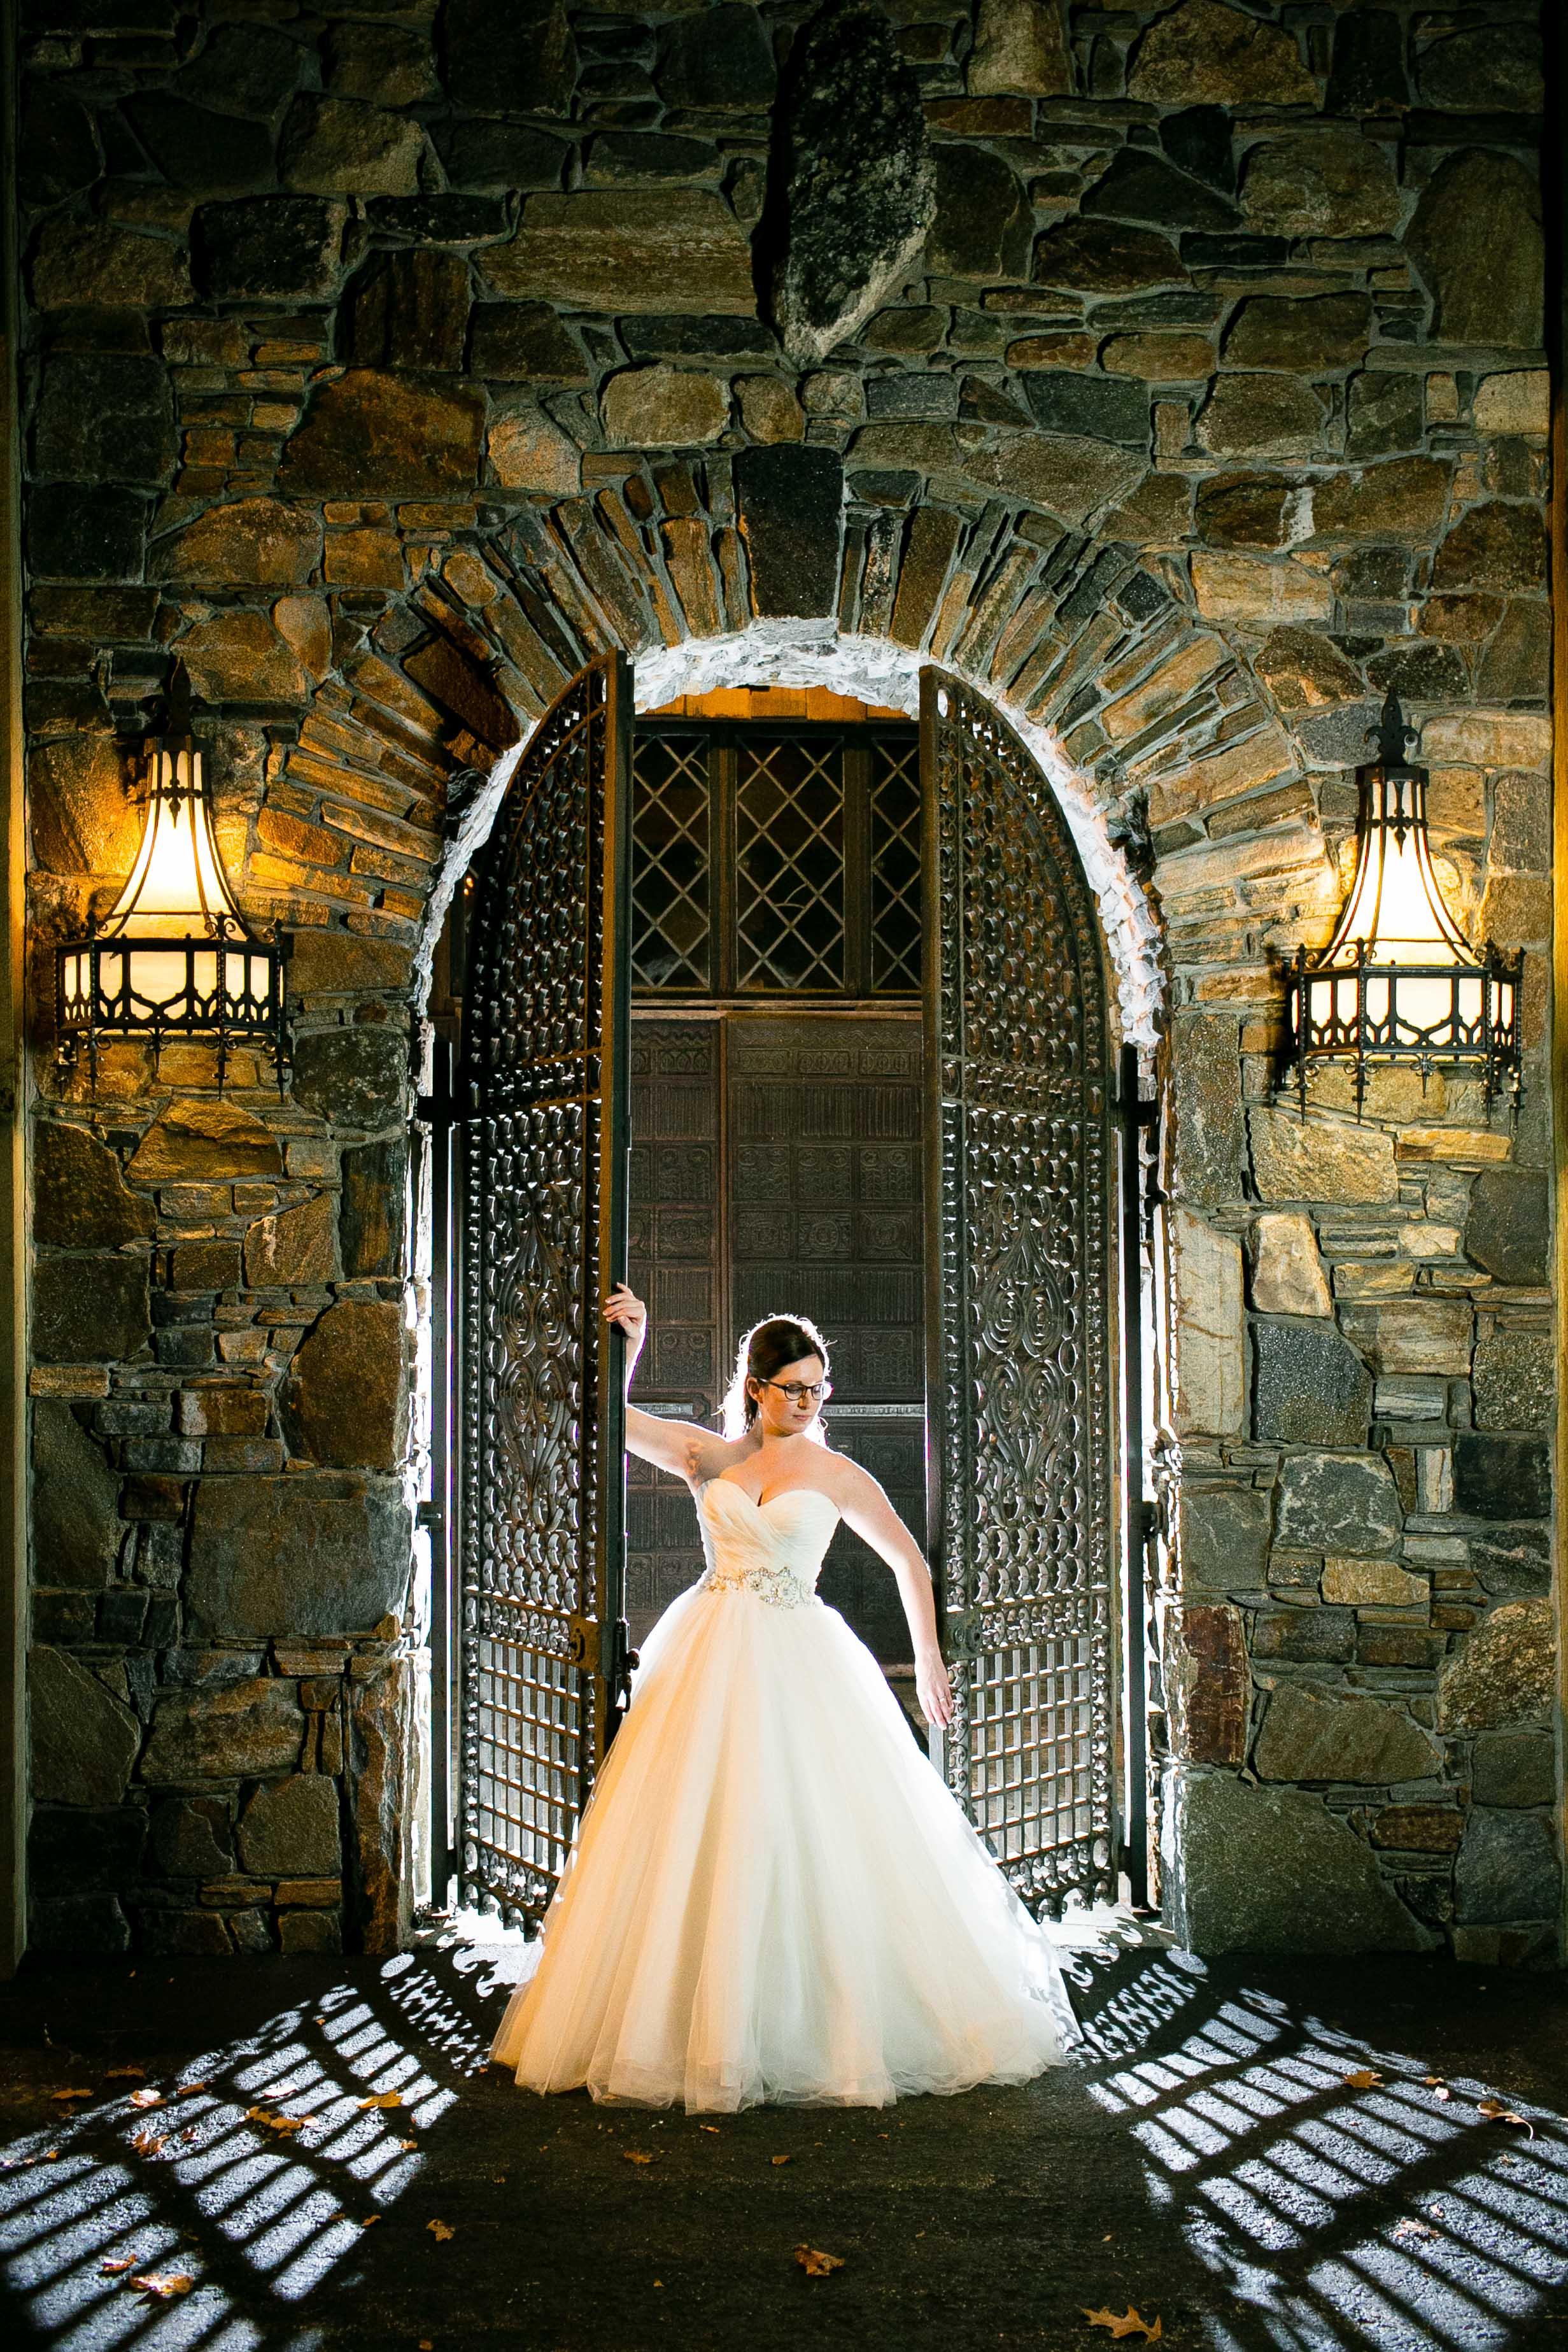 Creative-Wedding-Photography-Bill-Millers-Castle-Connecticut-Jacek-Dolata-Photography-3.jpg